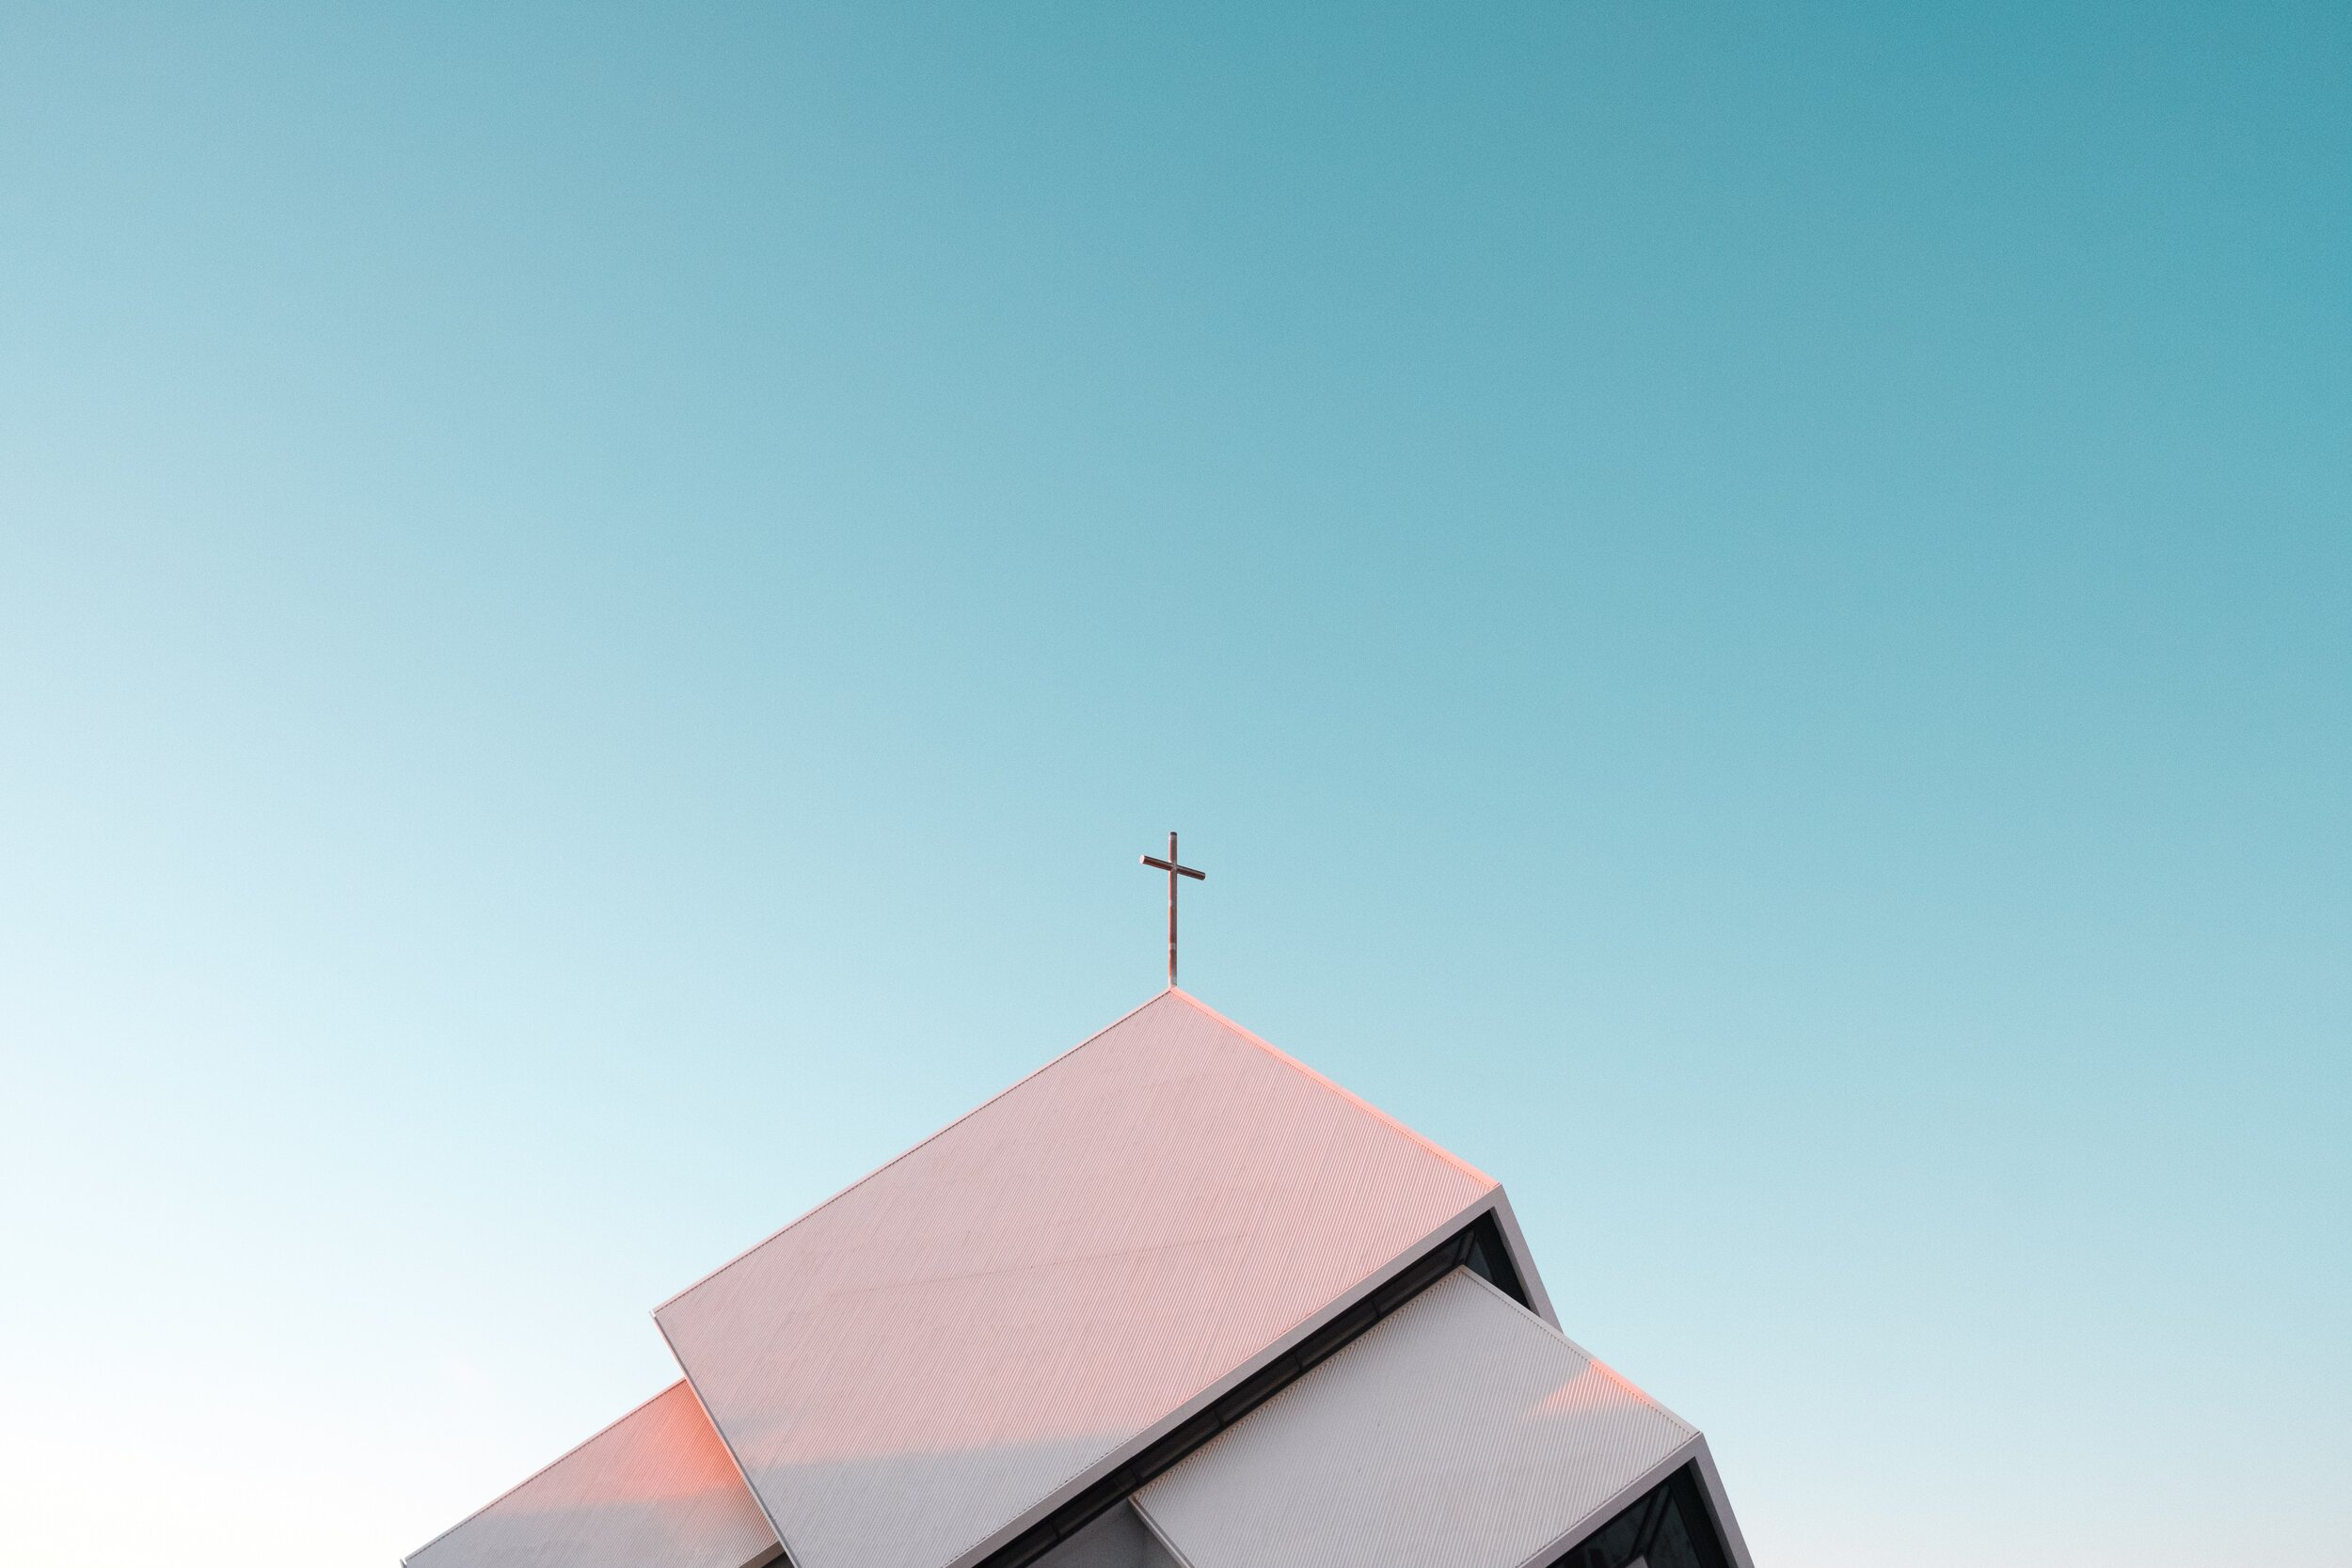 House Church in Brighton - 11AM: Esther (603-369-0891)